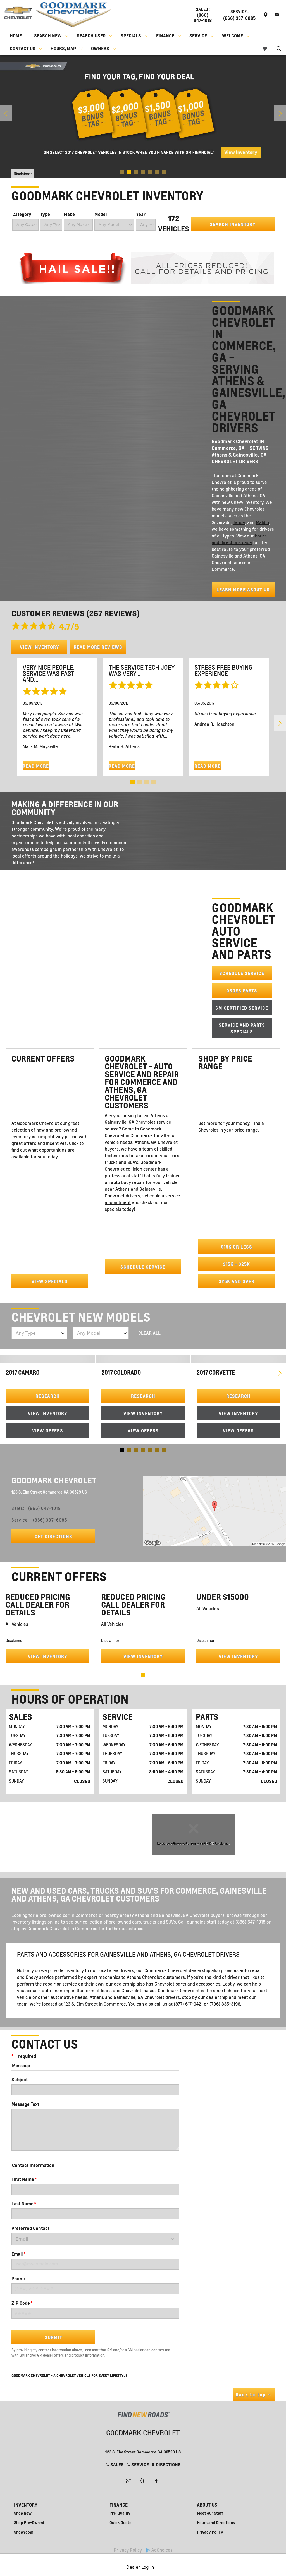 Goodmark Chevrolet Website History